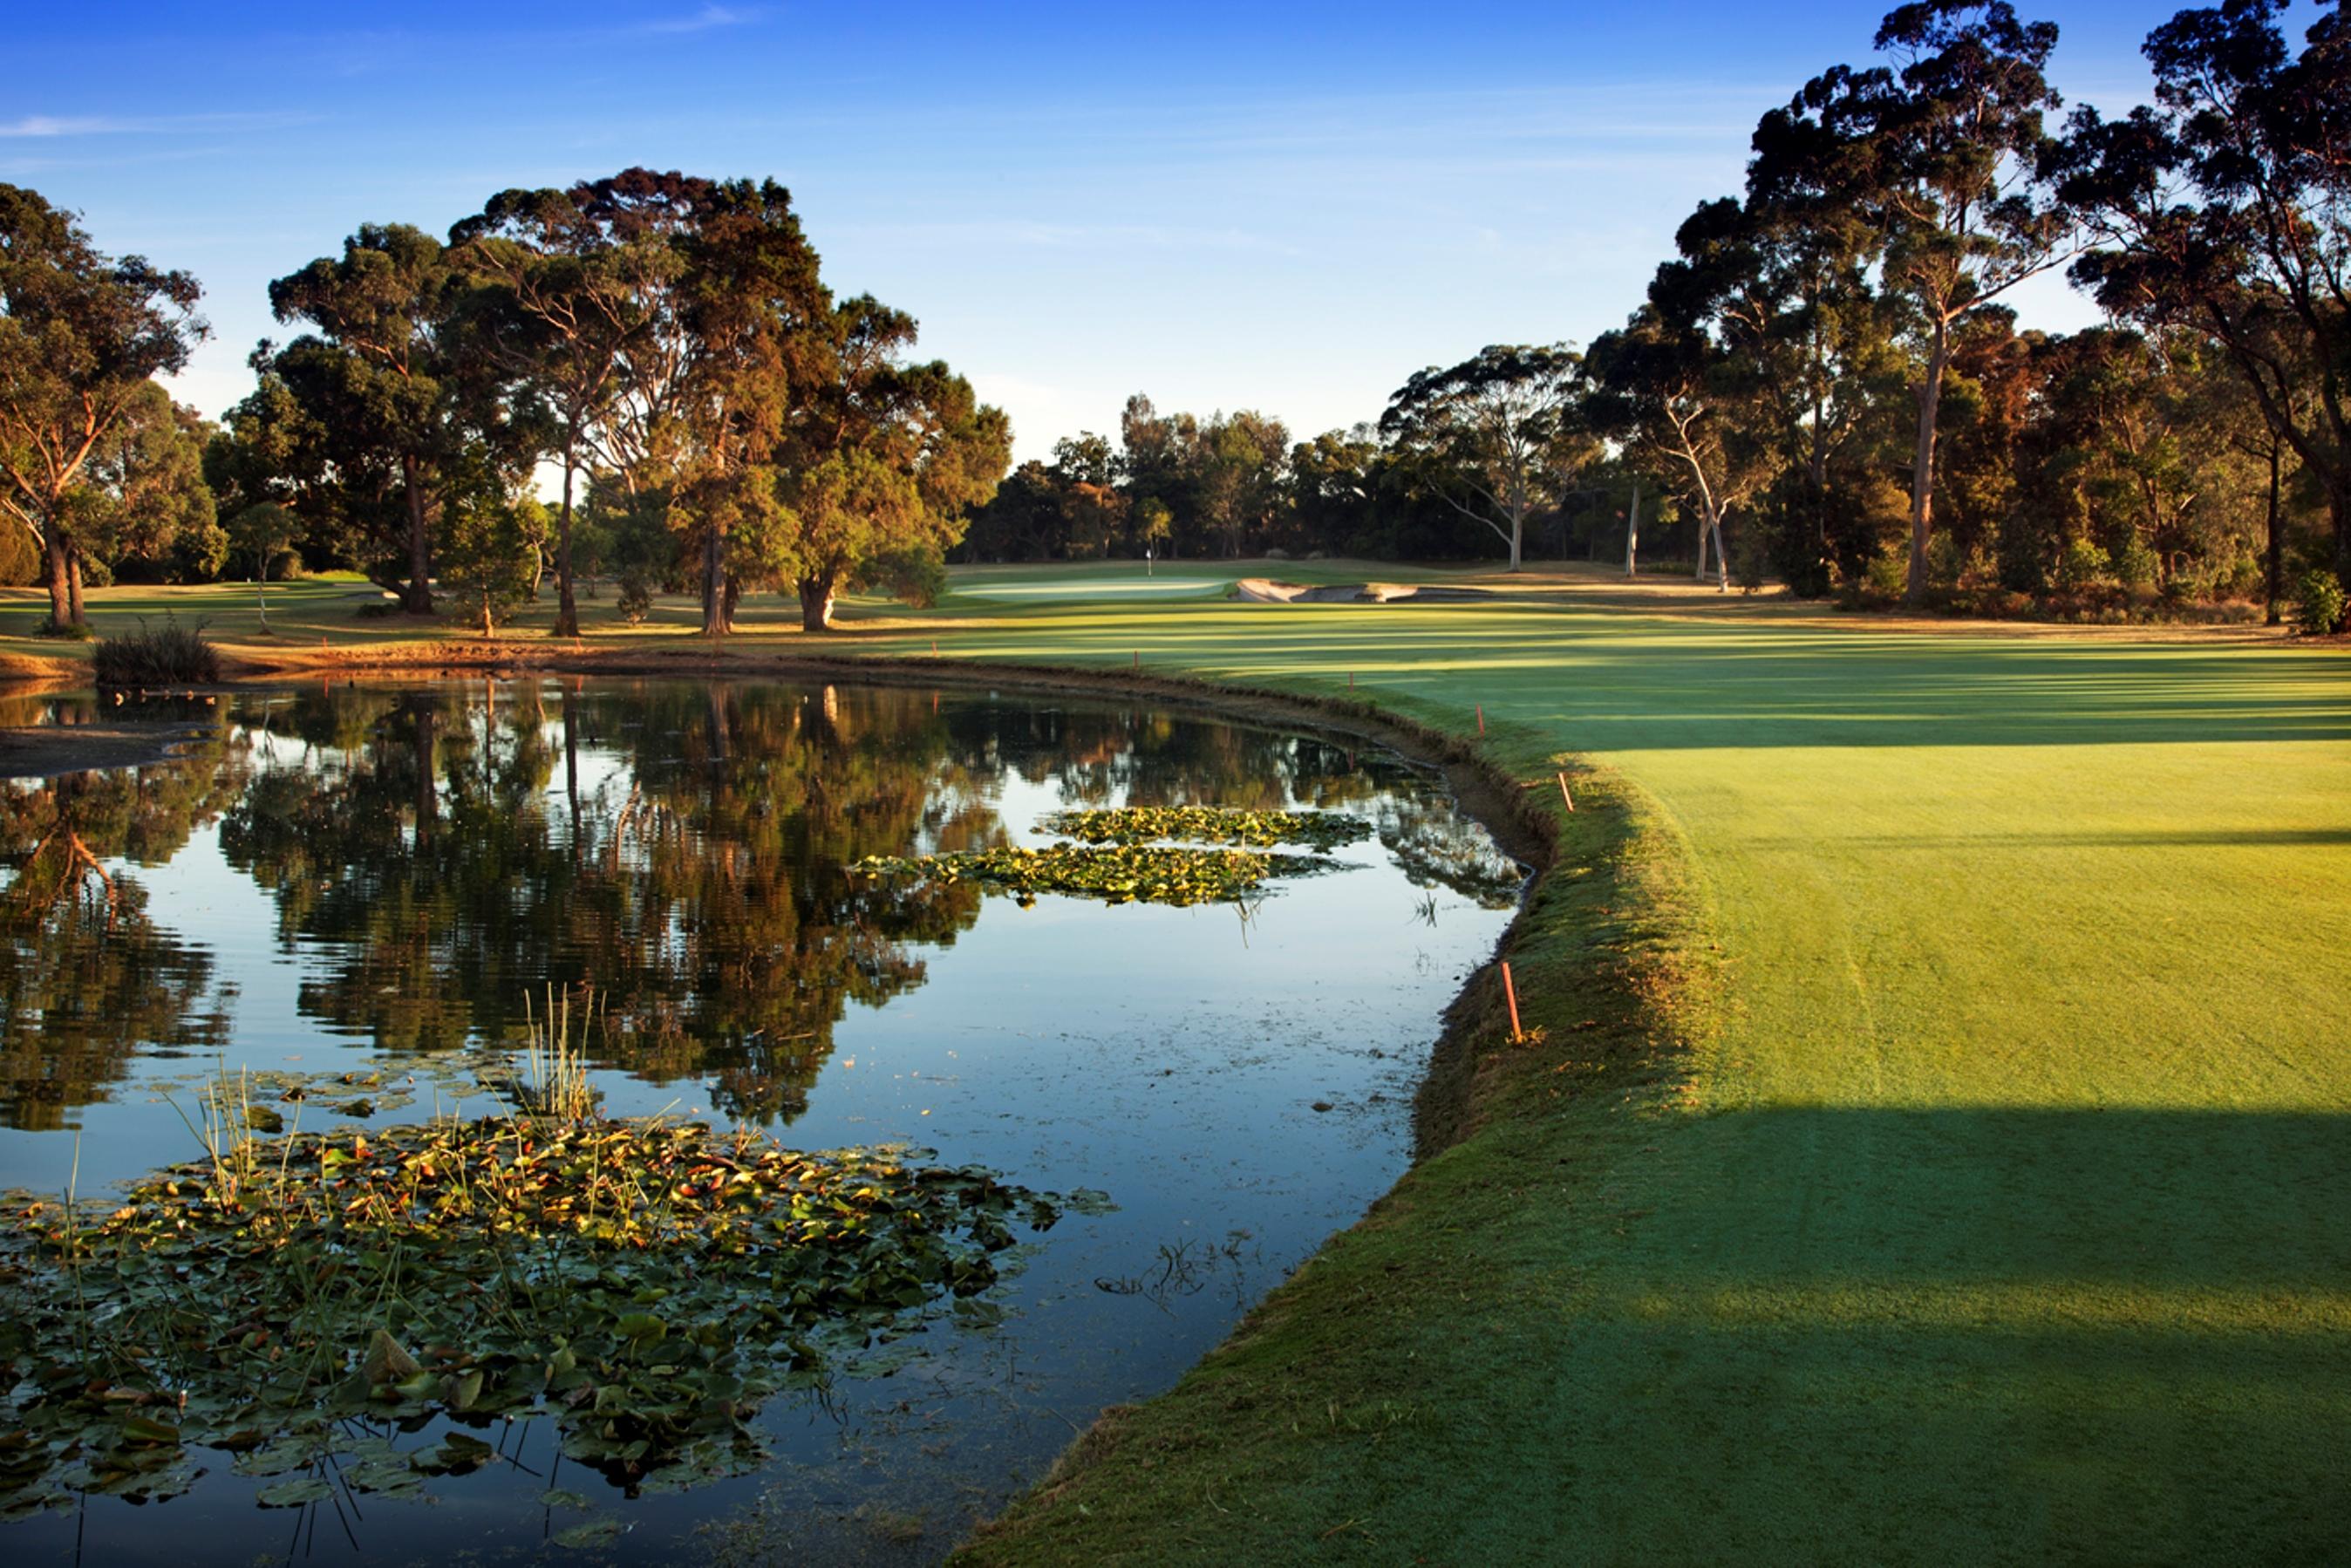 Melbourne self drive golf tour